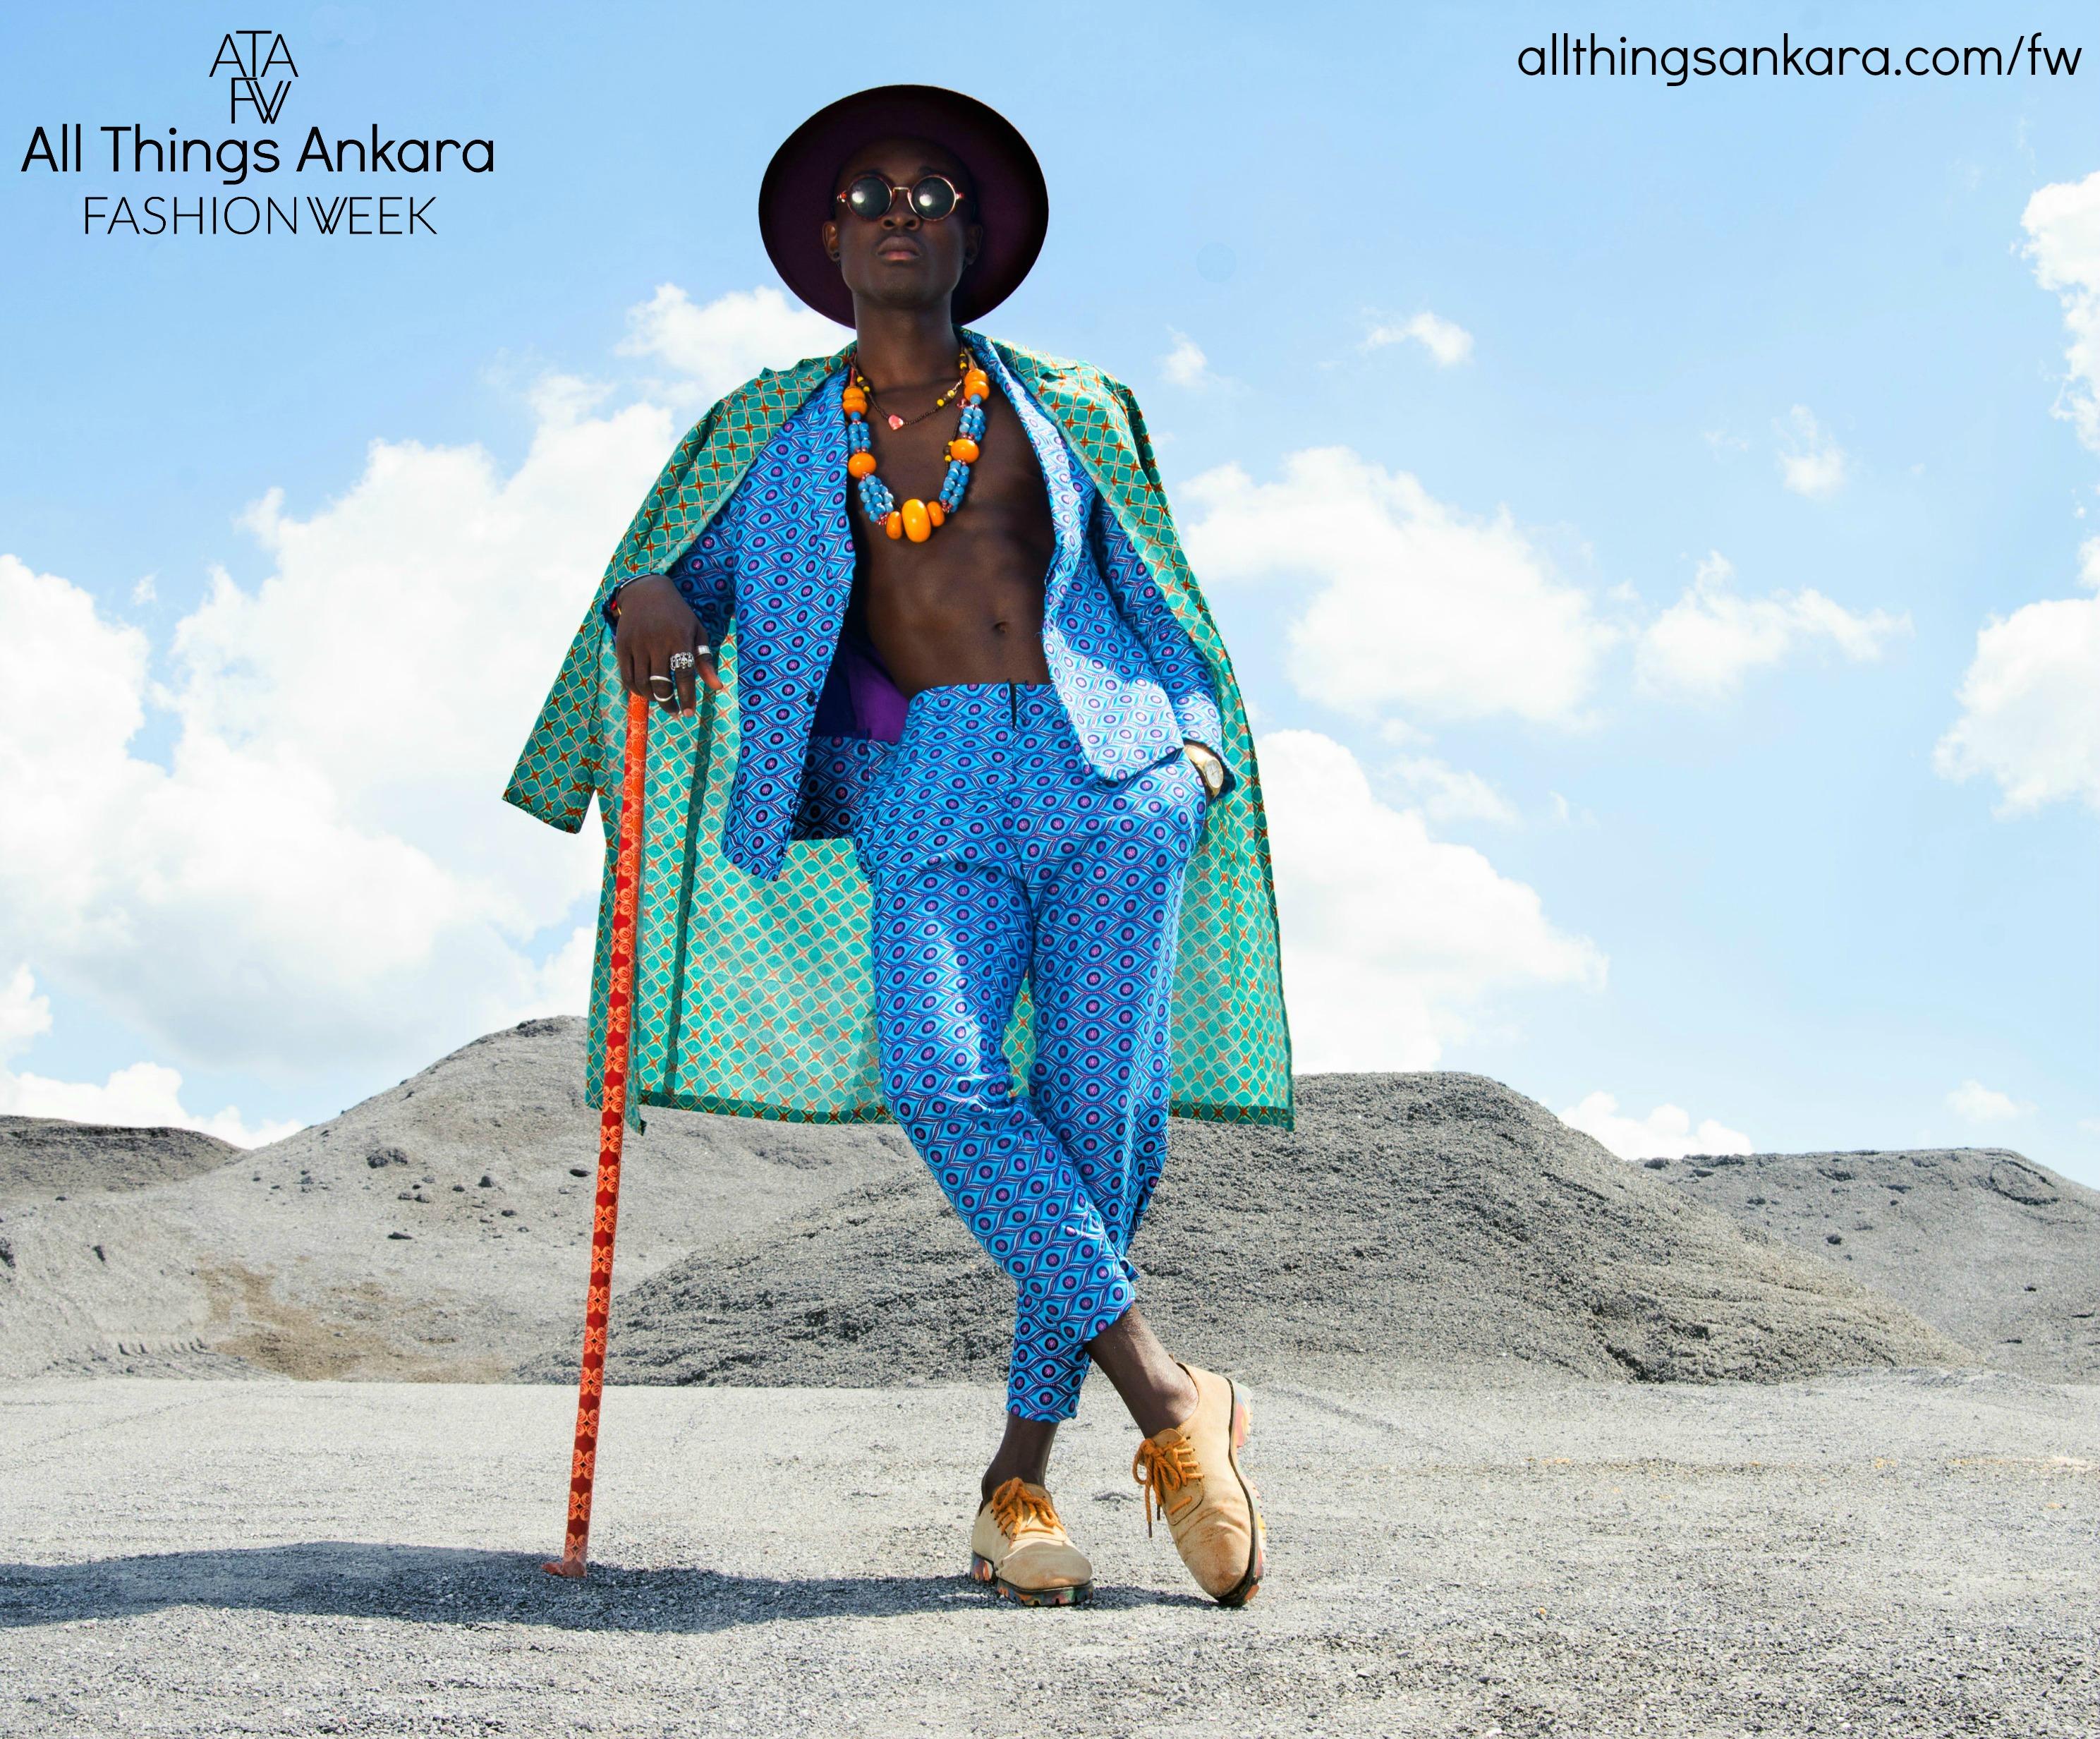 all-things-ankara-fashion-week-2015-campaign-7